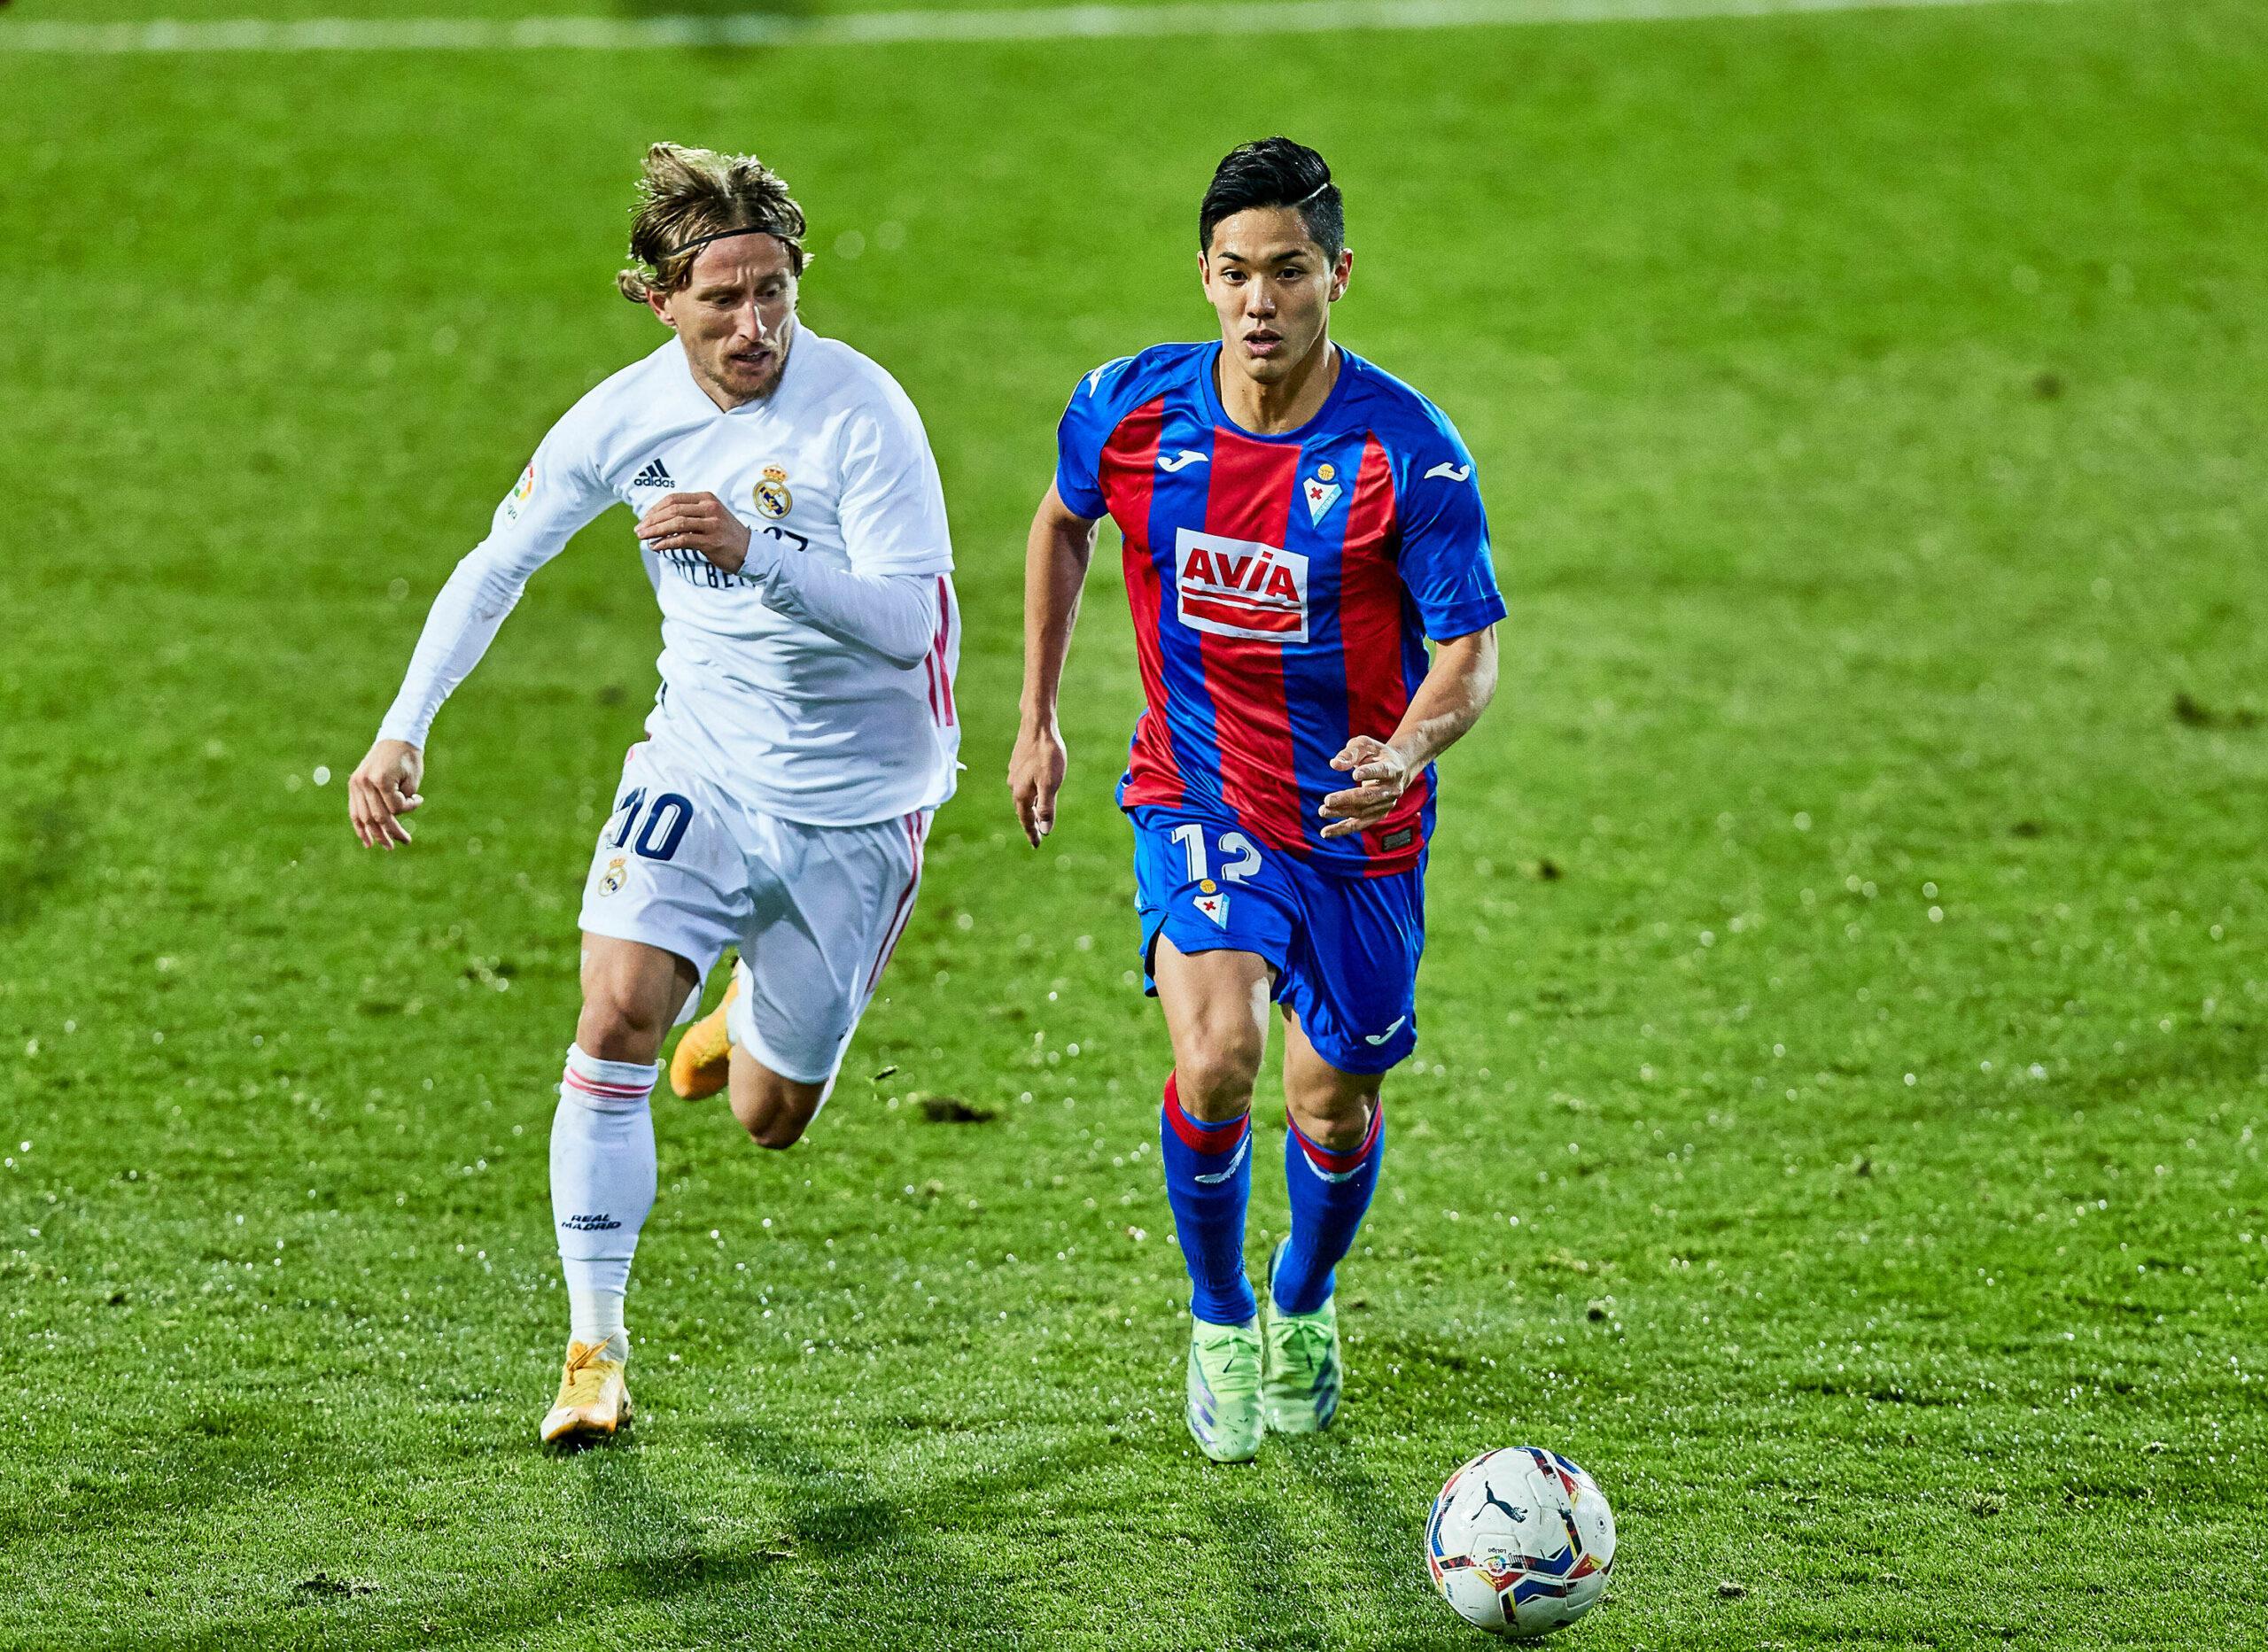 Zweikampf Luka Modric (Real Madrid) Yoshinori Muto (Eibar)